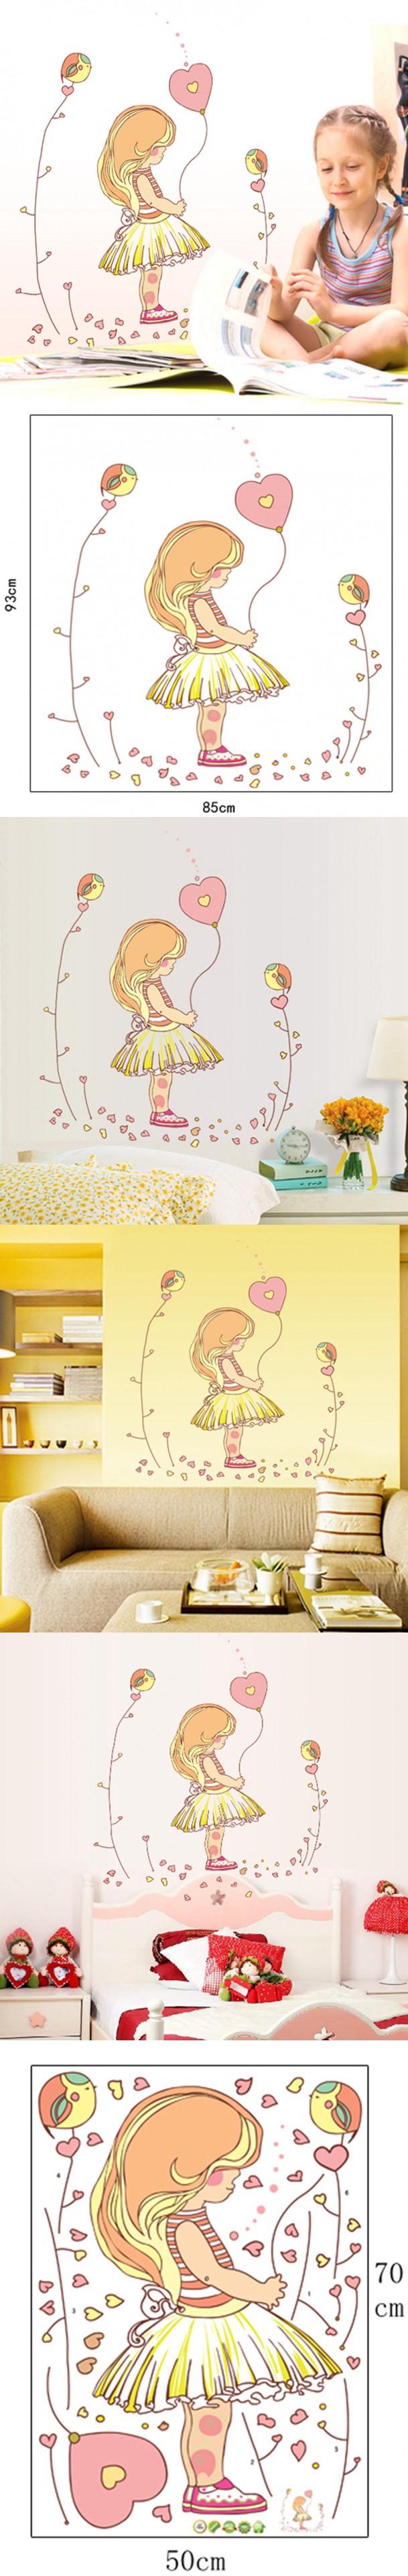 Wall Sticker Wall Decal Home Decor Adhesive Art Mural Diy Cute Girl ...